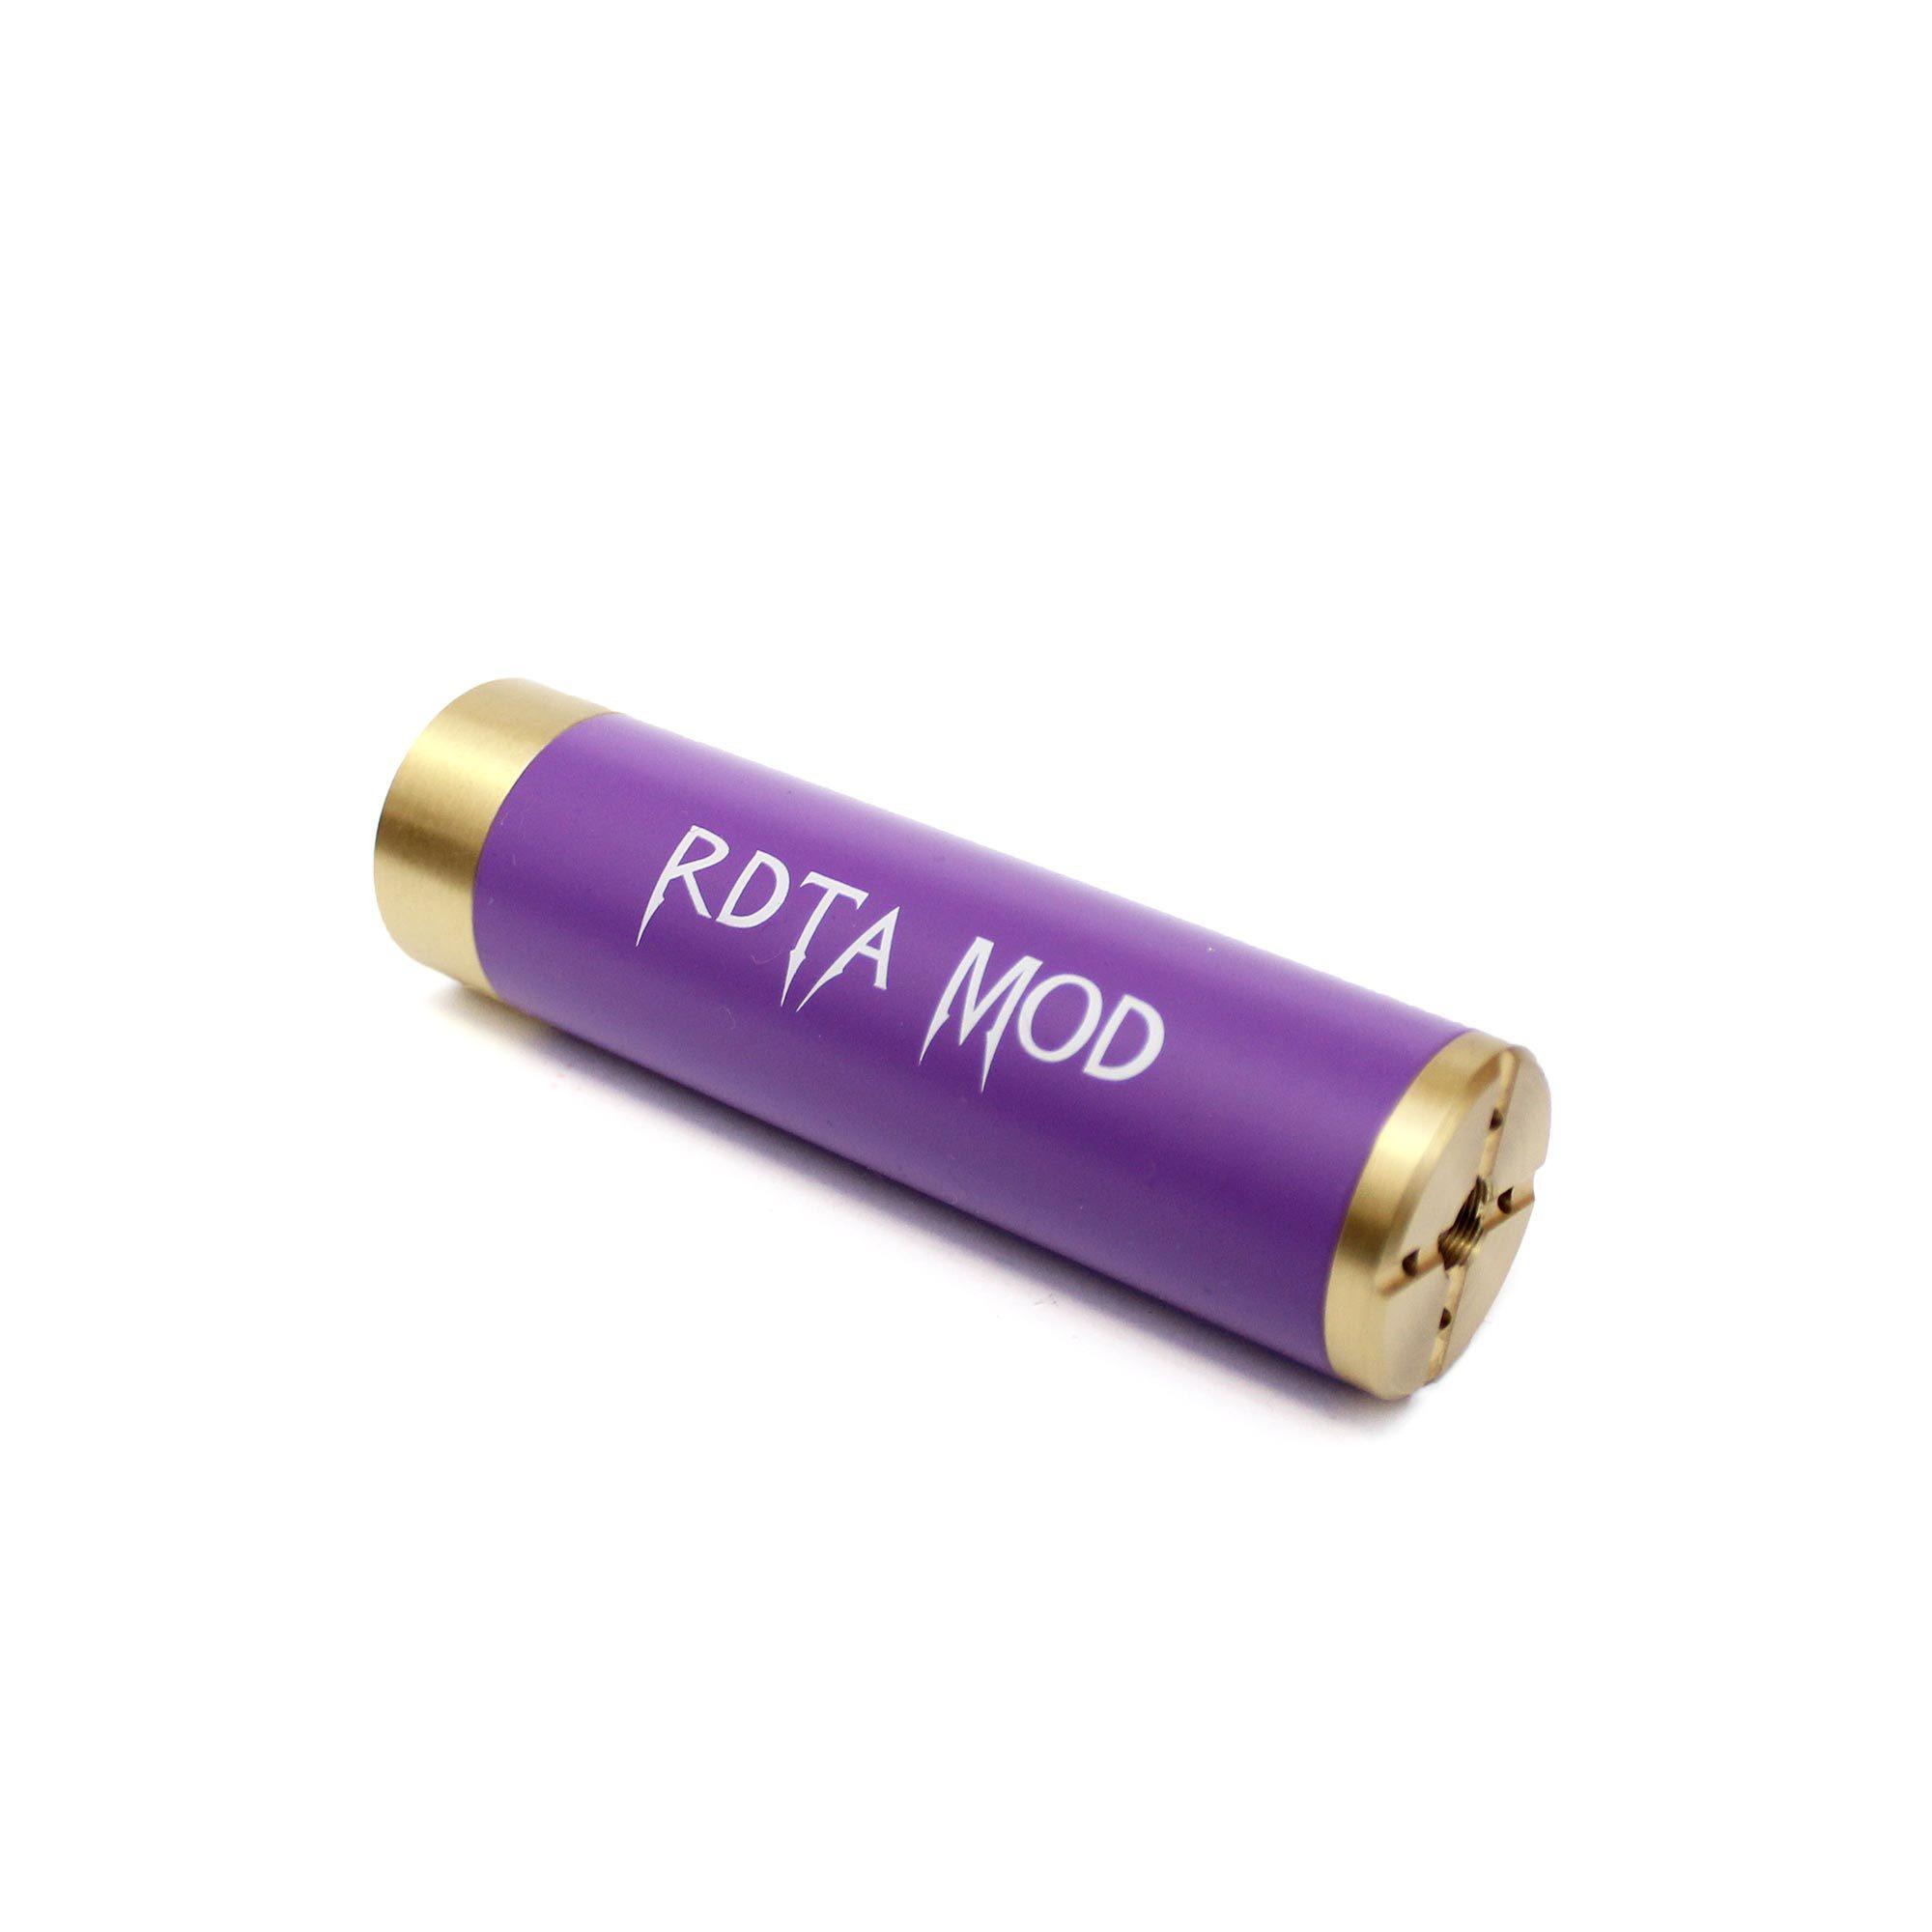 Набор Limitless RDTA Mod Kit (Authentic) трубка